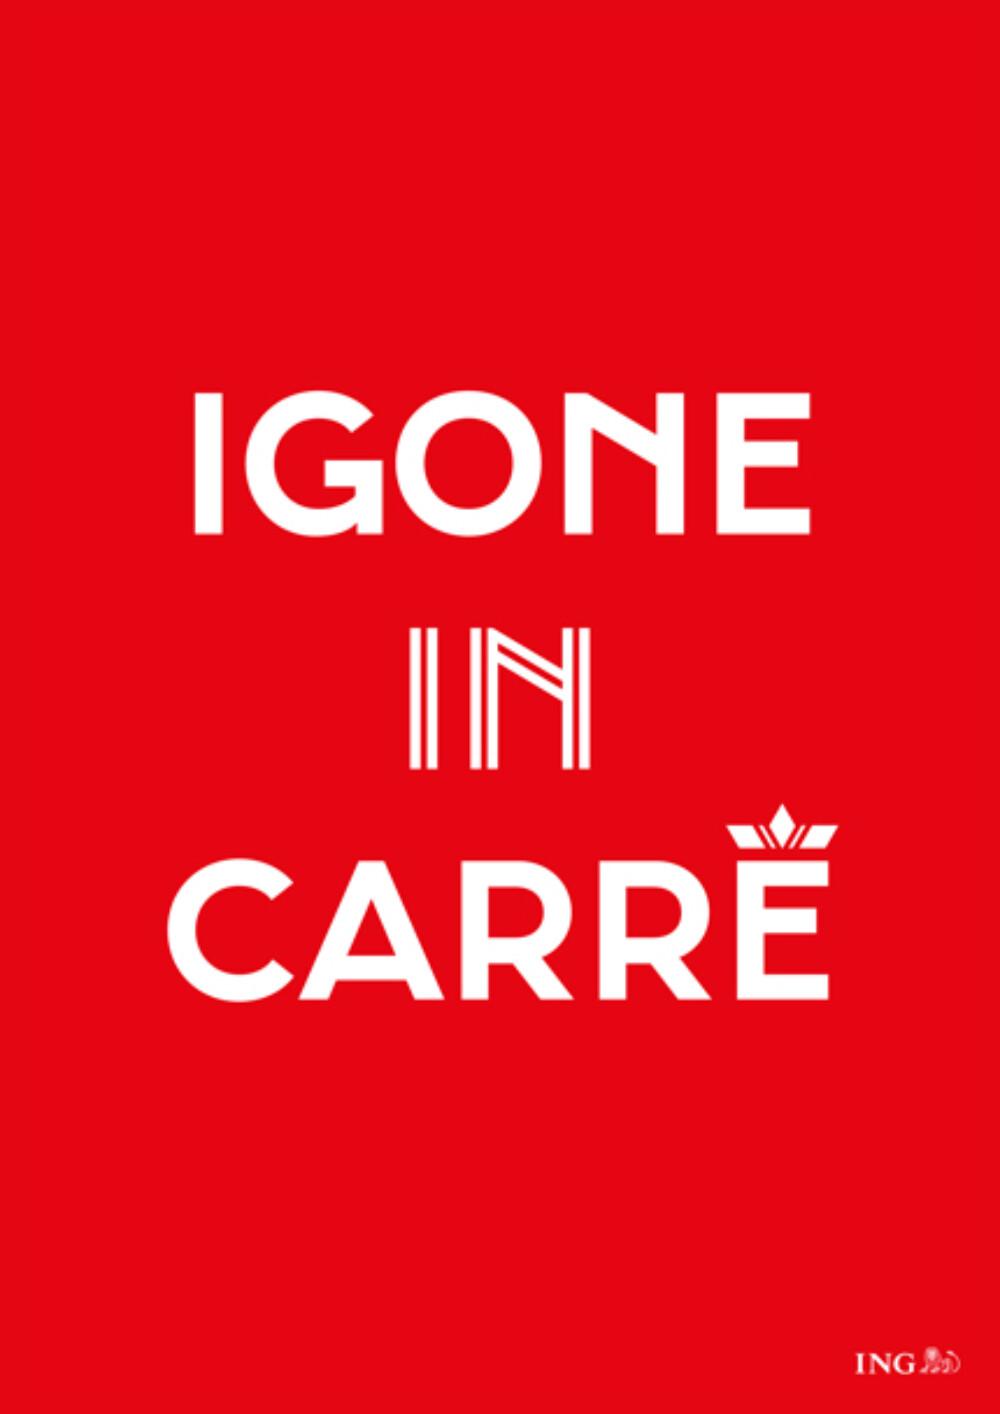 Igone de Jongh - Igone in Carré